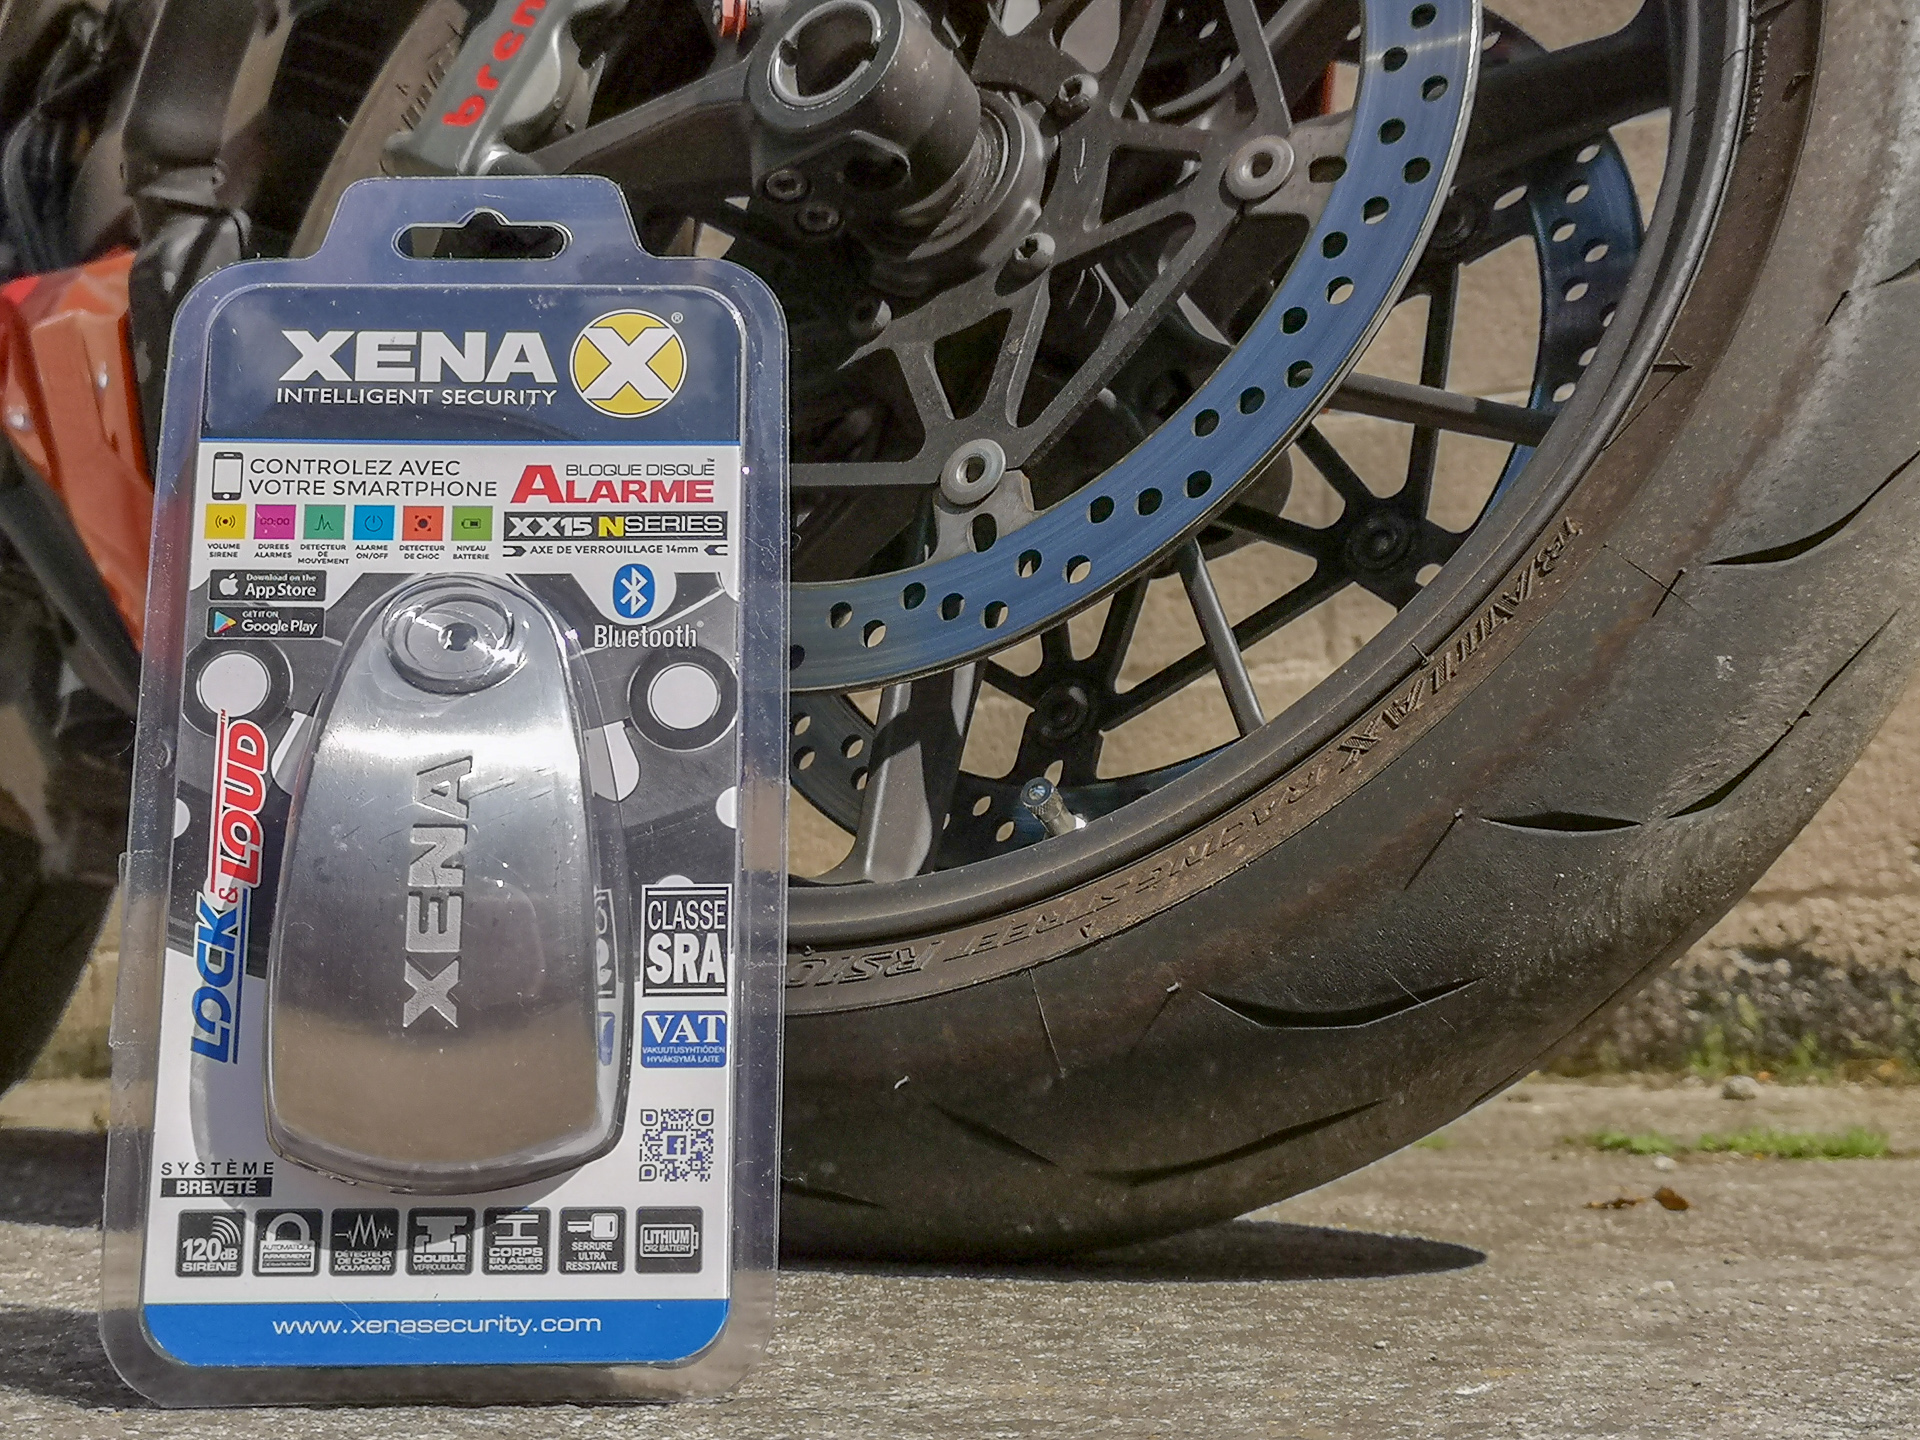 essai de l'antivol bloque disque Xena avec alarme SRA XX15